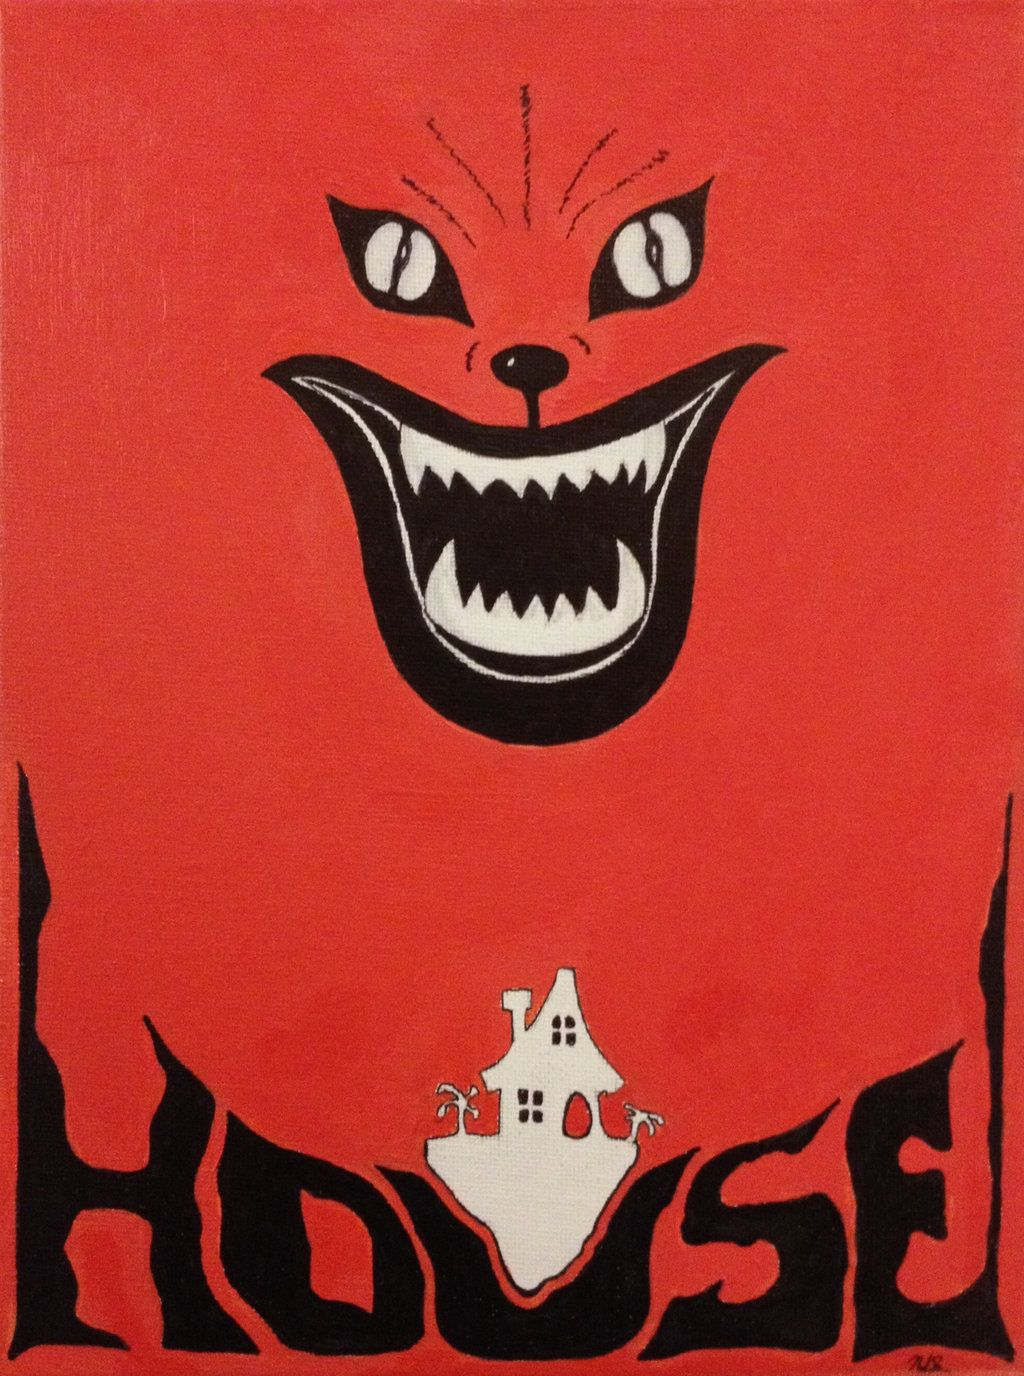 Uncle J Diamondd's Horror Movie in 2020